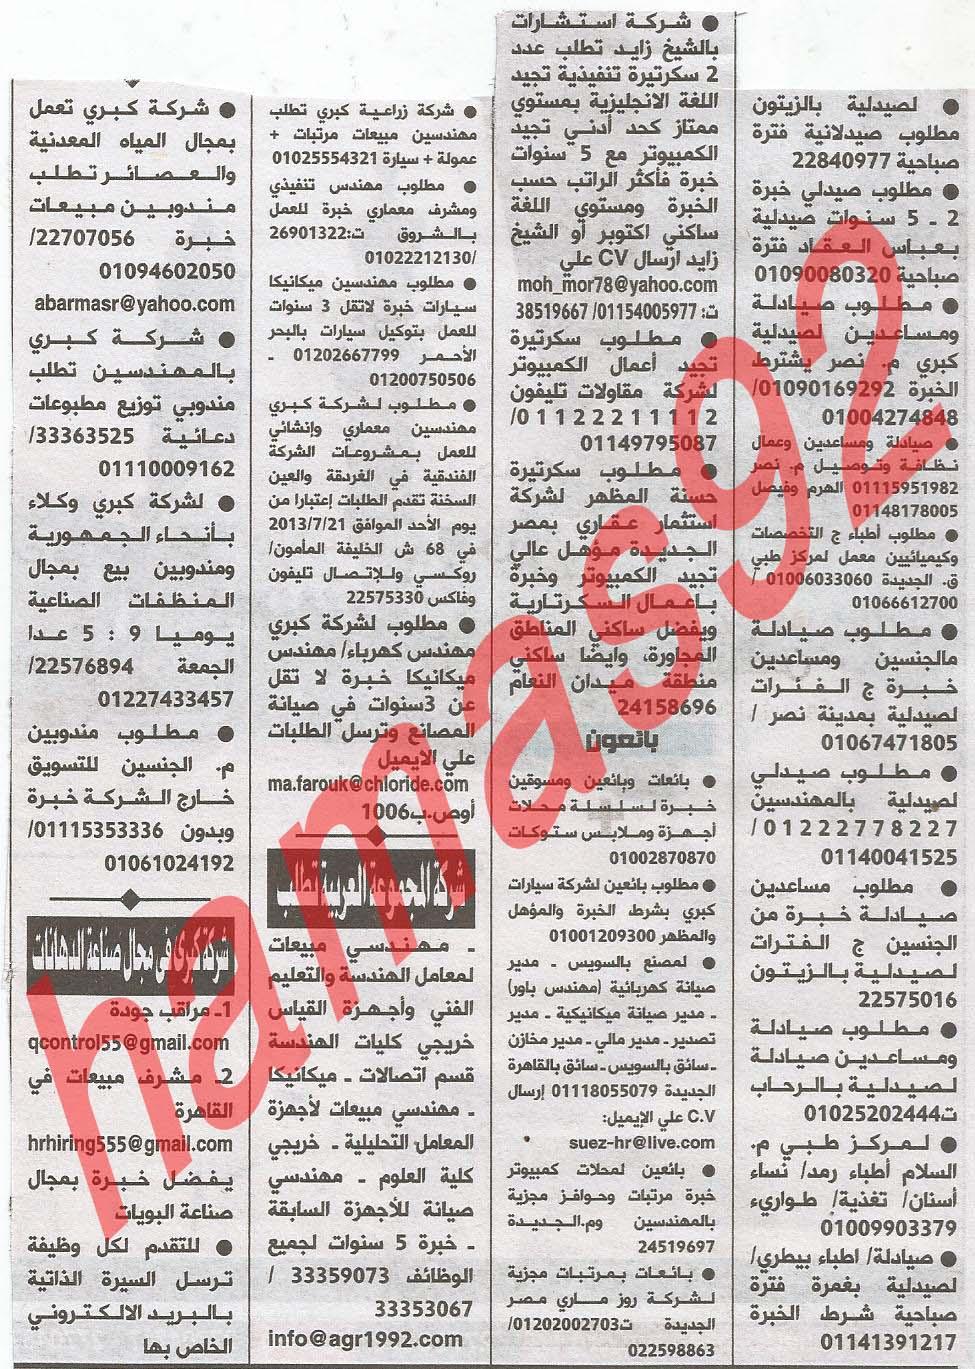 b35575268 وظائف جريدة بانوراما الاهرام المصرية 13 رمضان. مطلوب فنييون وعمال - سائقون.  امن وحراسة - مدرسون. وظائف فى مكتب استيراد وتصدير